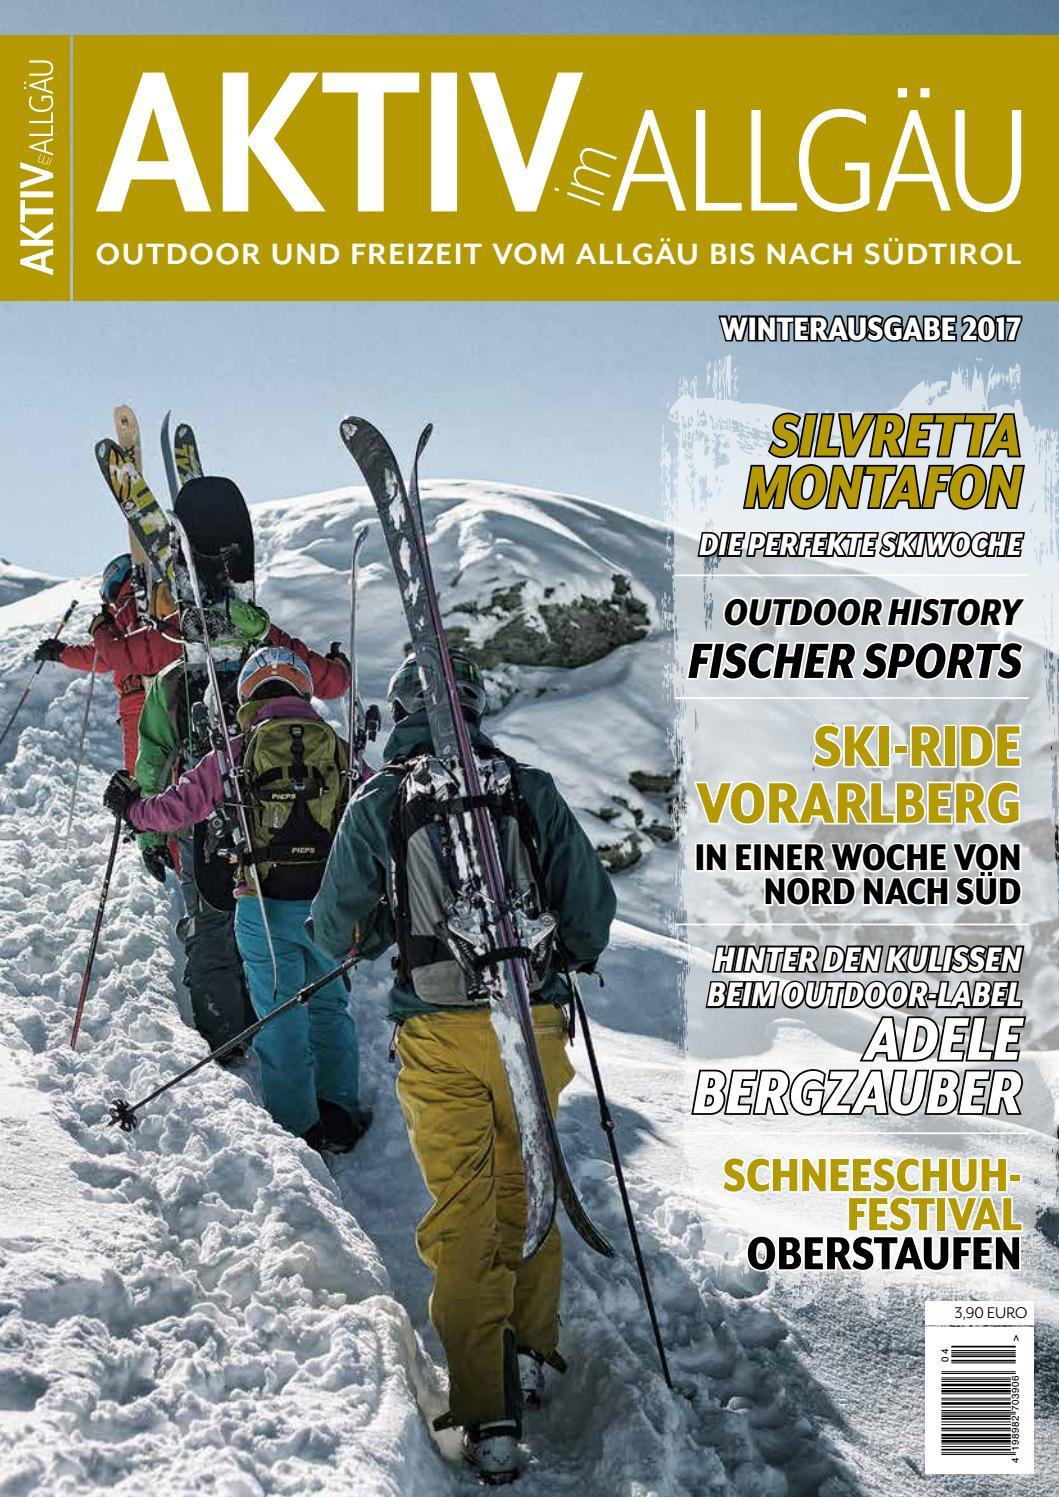 TRAK Nova T 1000 Langlaufski 205 cm + Salomon Flex 105 Steigzone Langlauf Ski | eBay